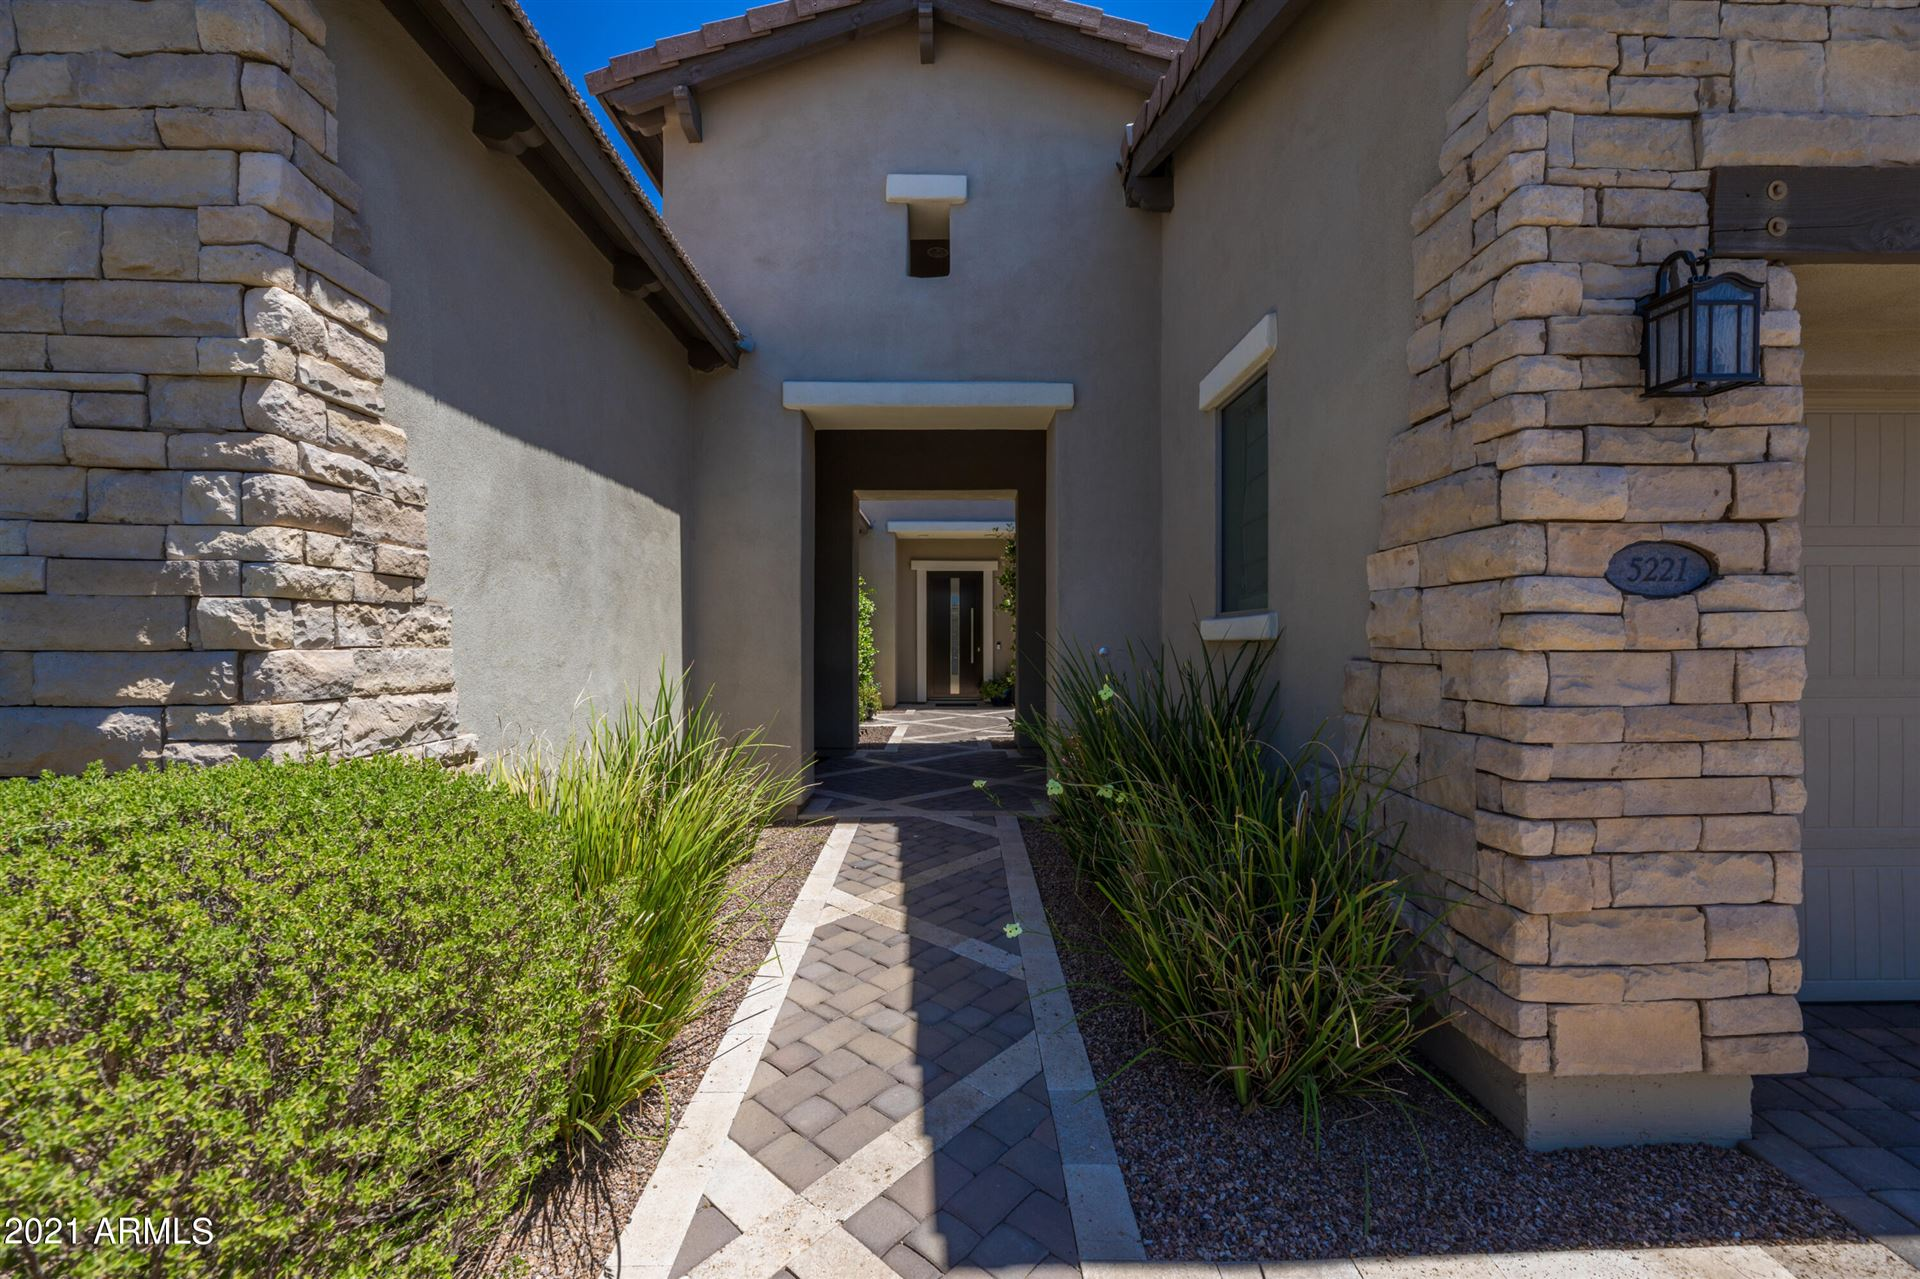 Photo of 5221 E BARWICK Drive, Cave Creek, AZ 85331 (MLS # 6231382)